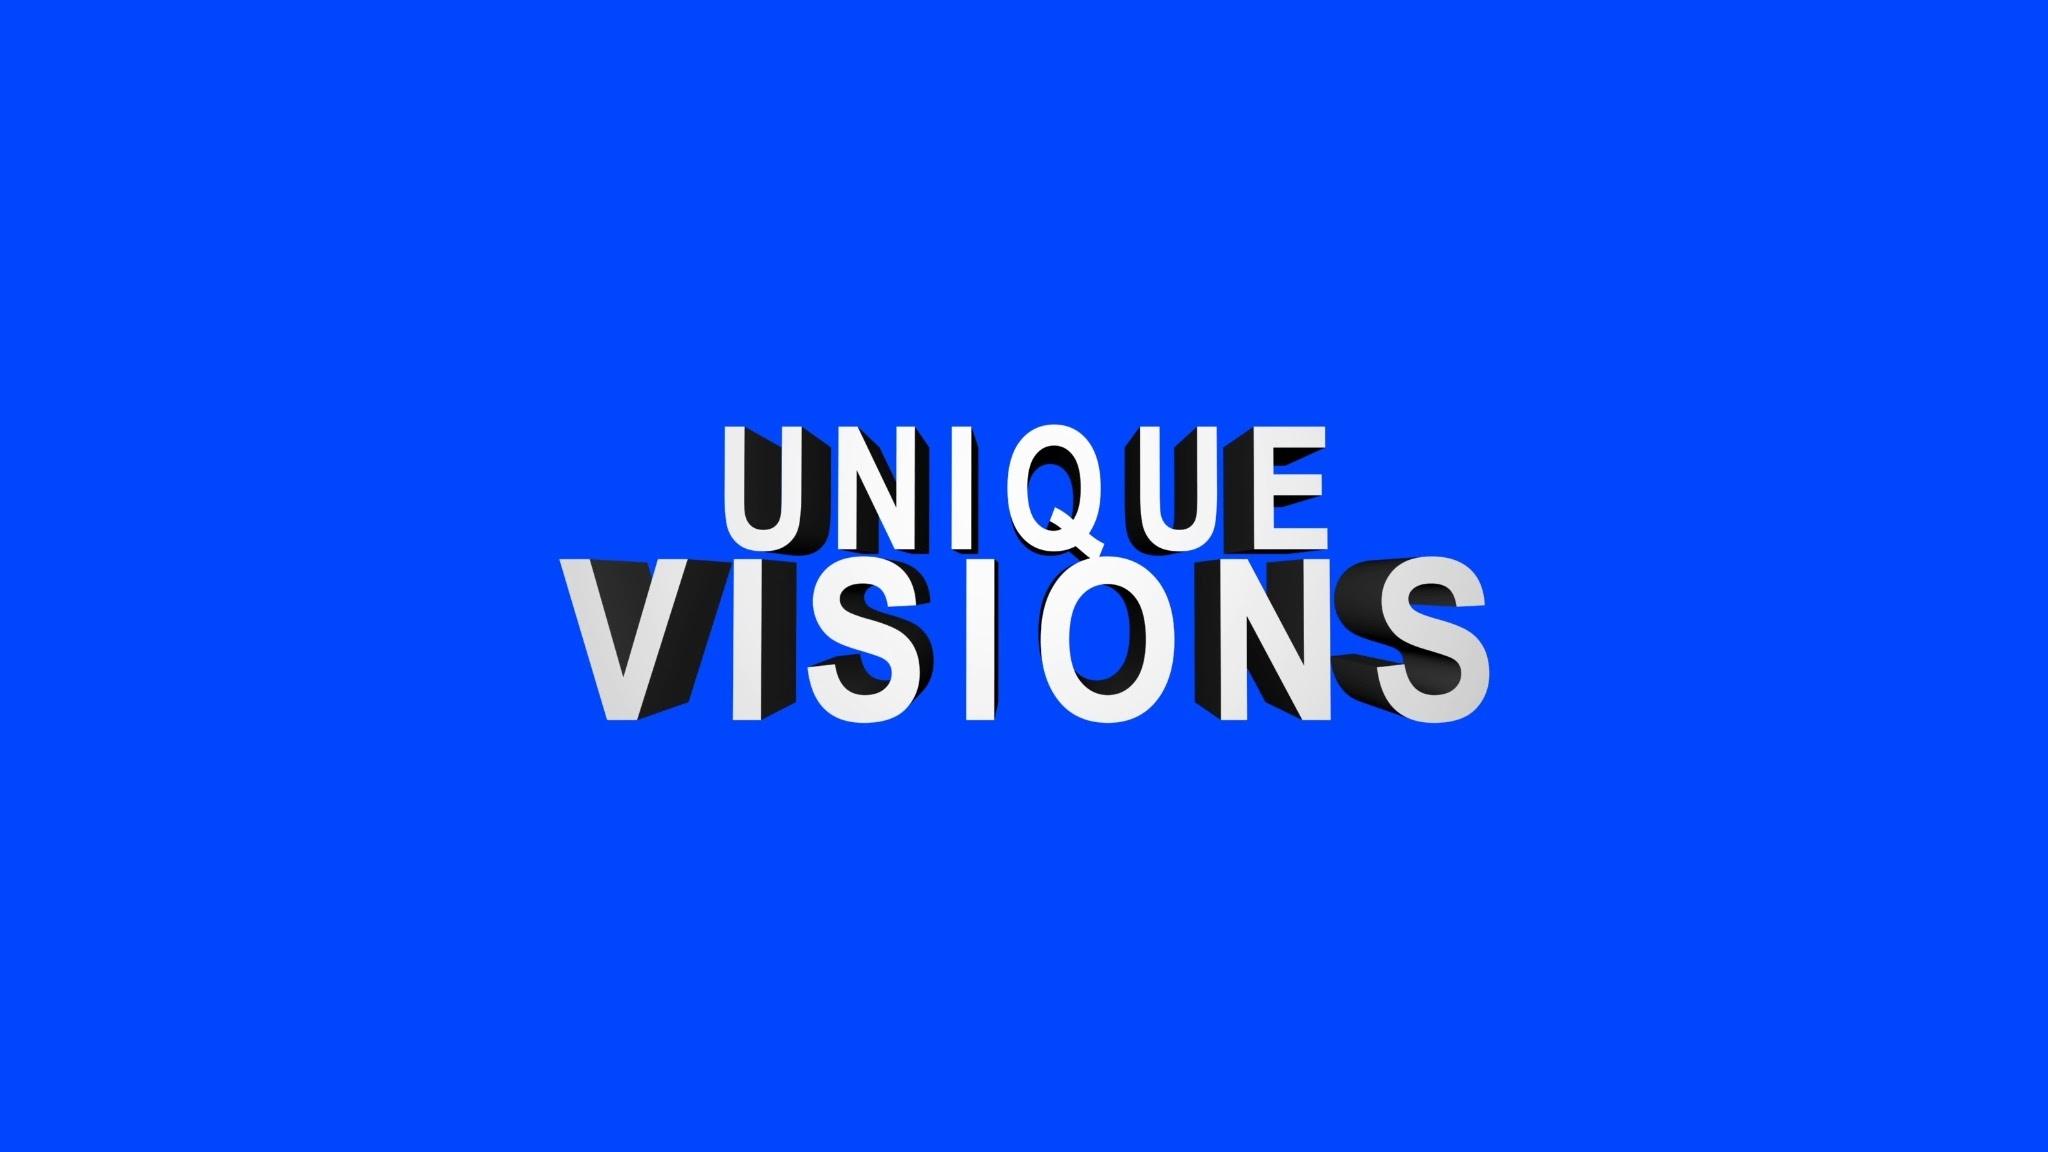 Unique Visions